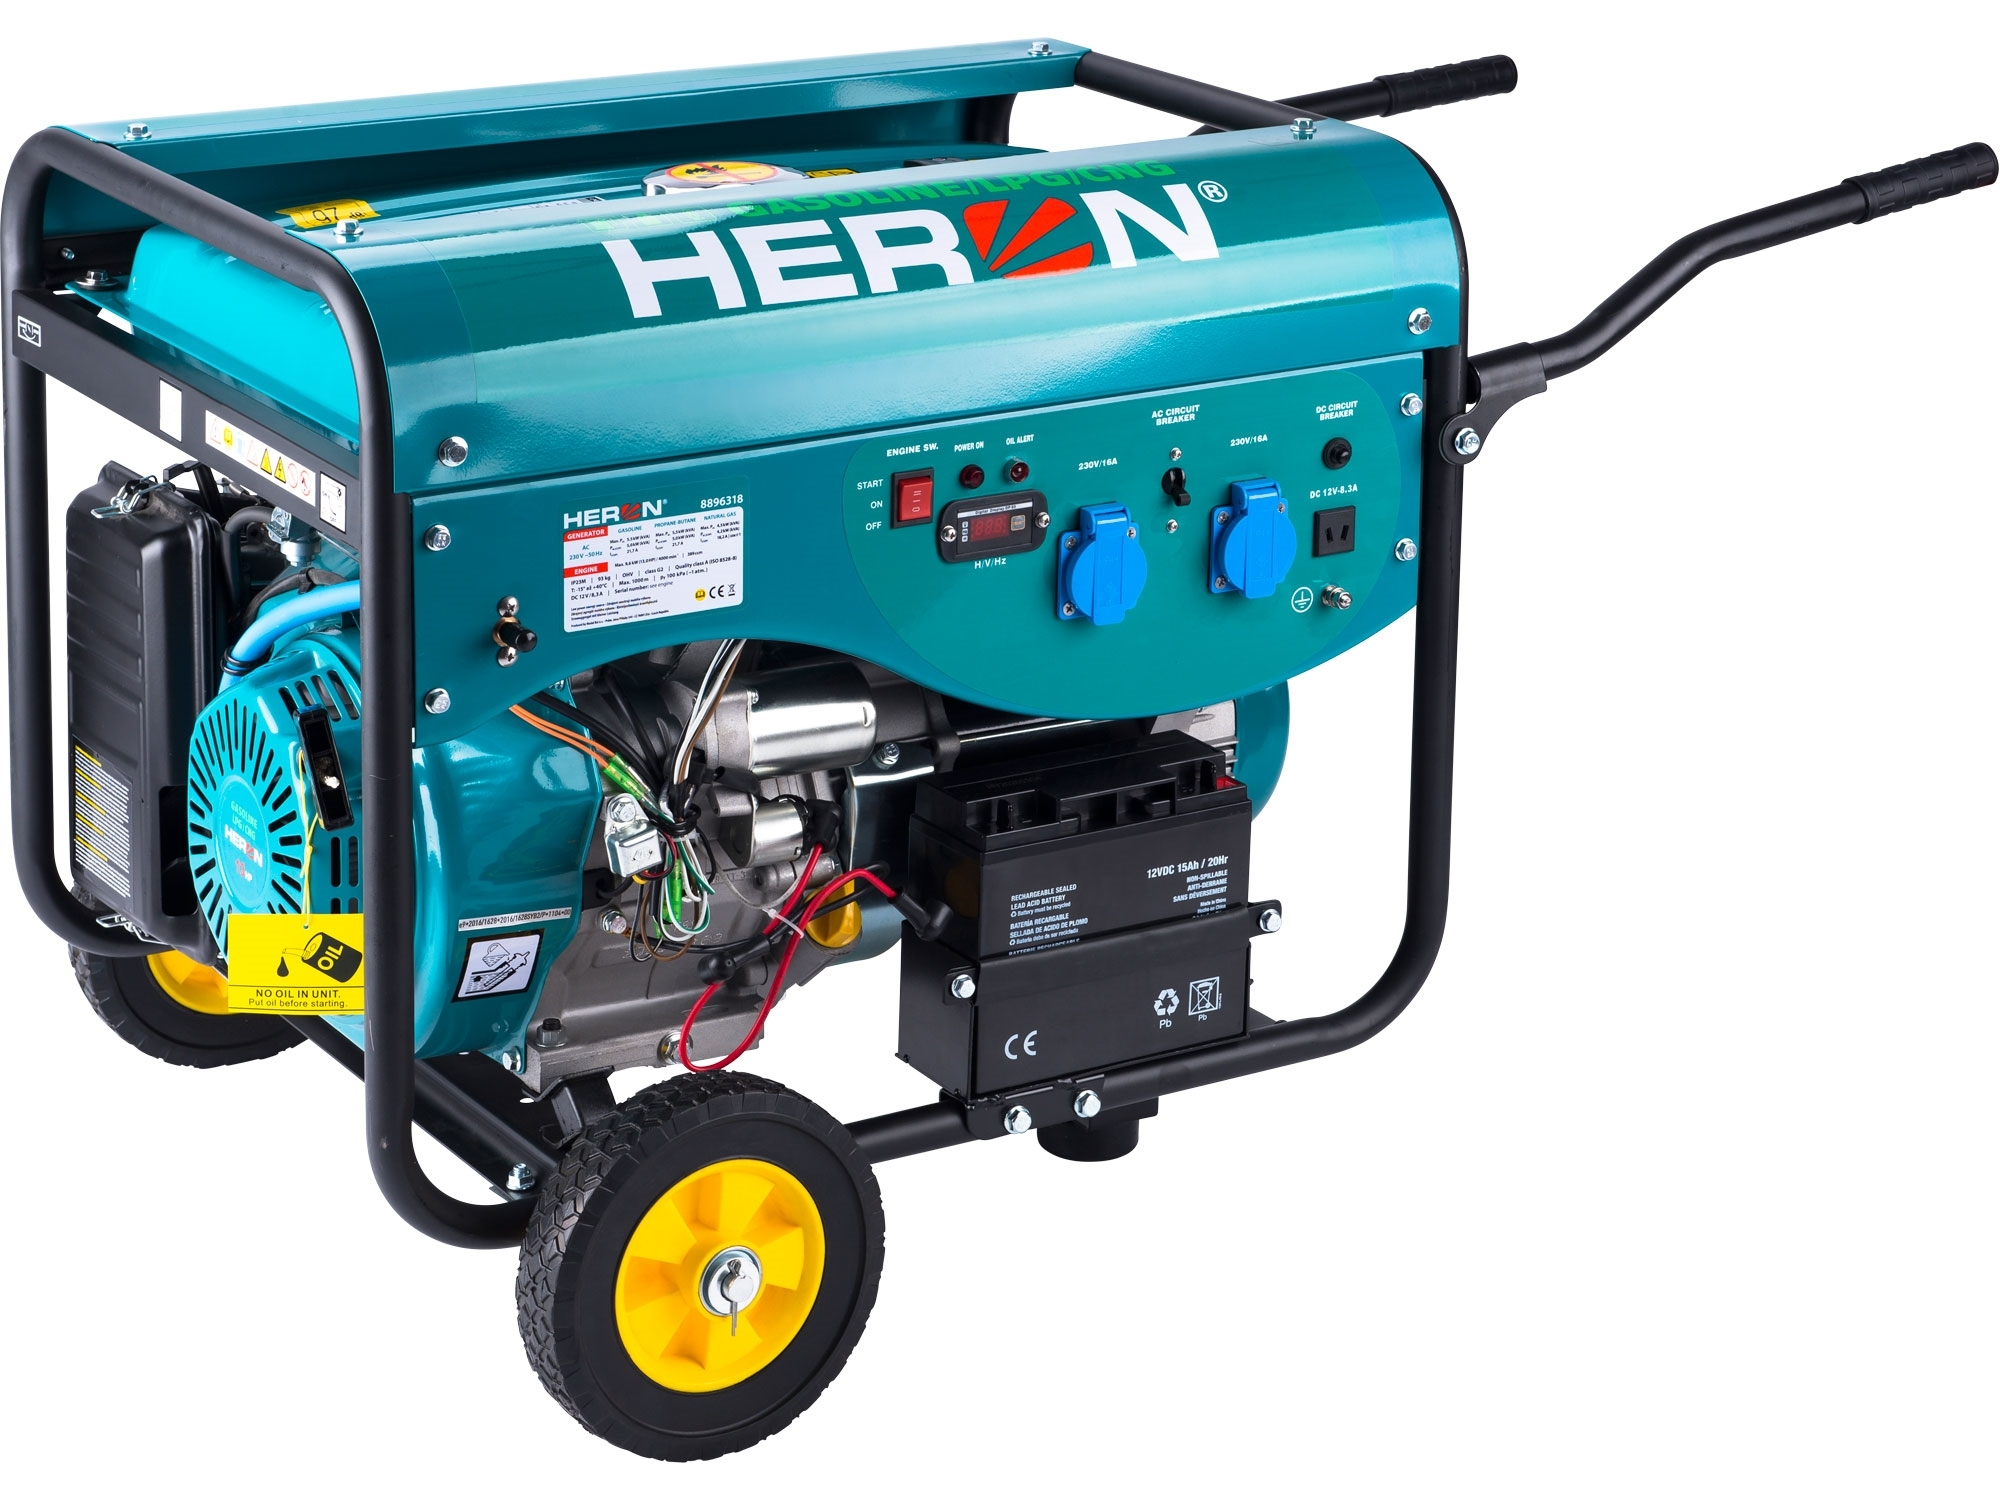 HERON elektrocentrála benzínová a plynová (LGP/NG) 13HP/5,5kW, elektrický start